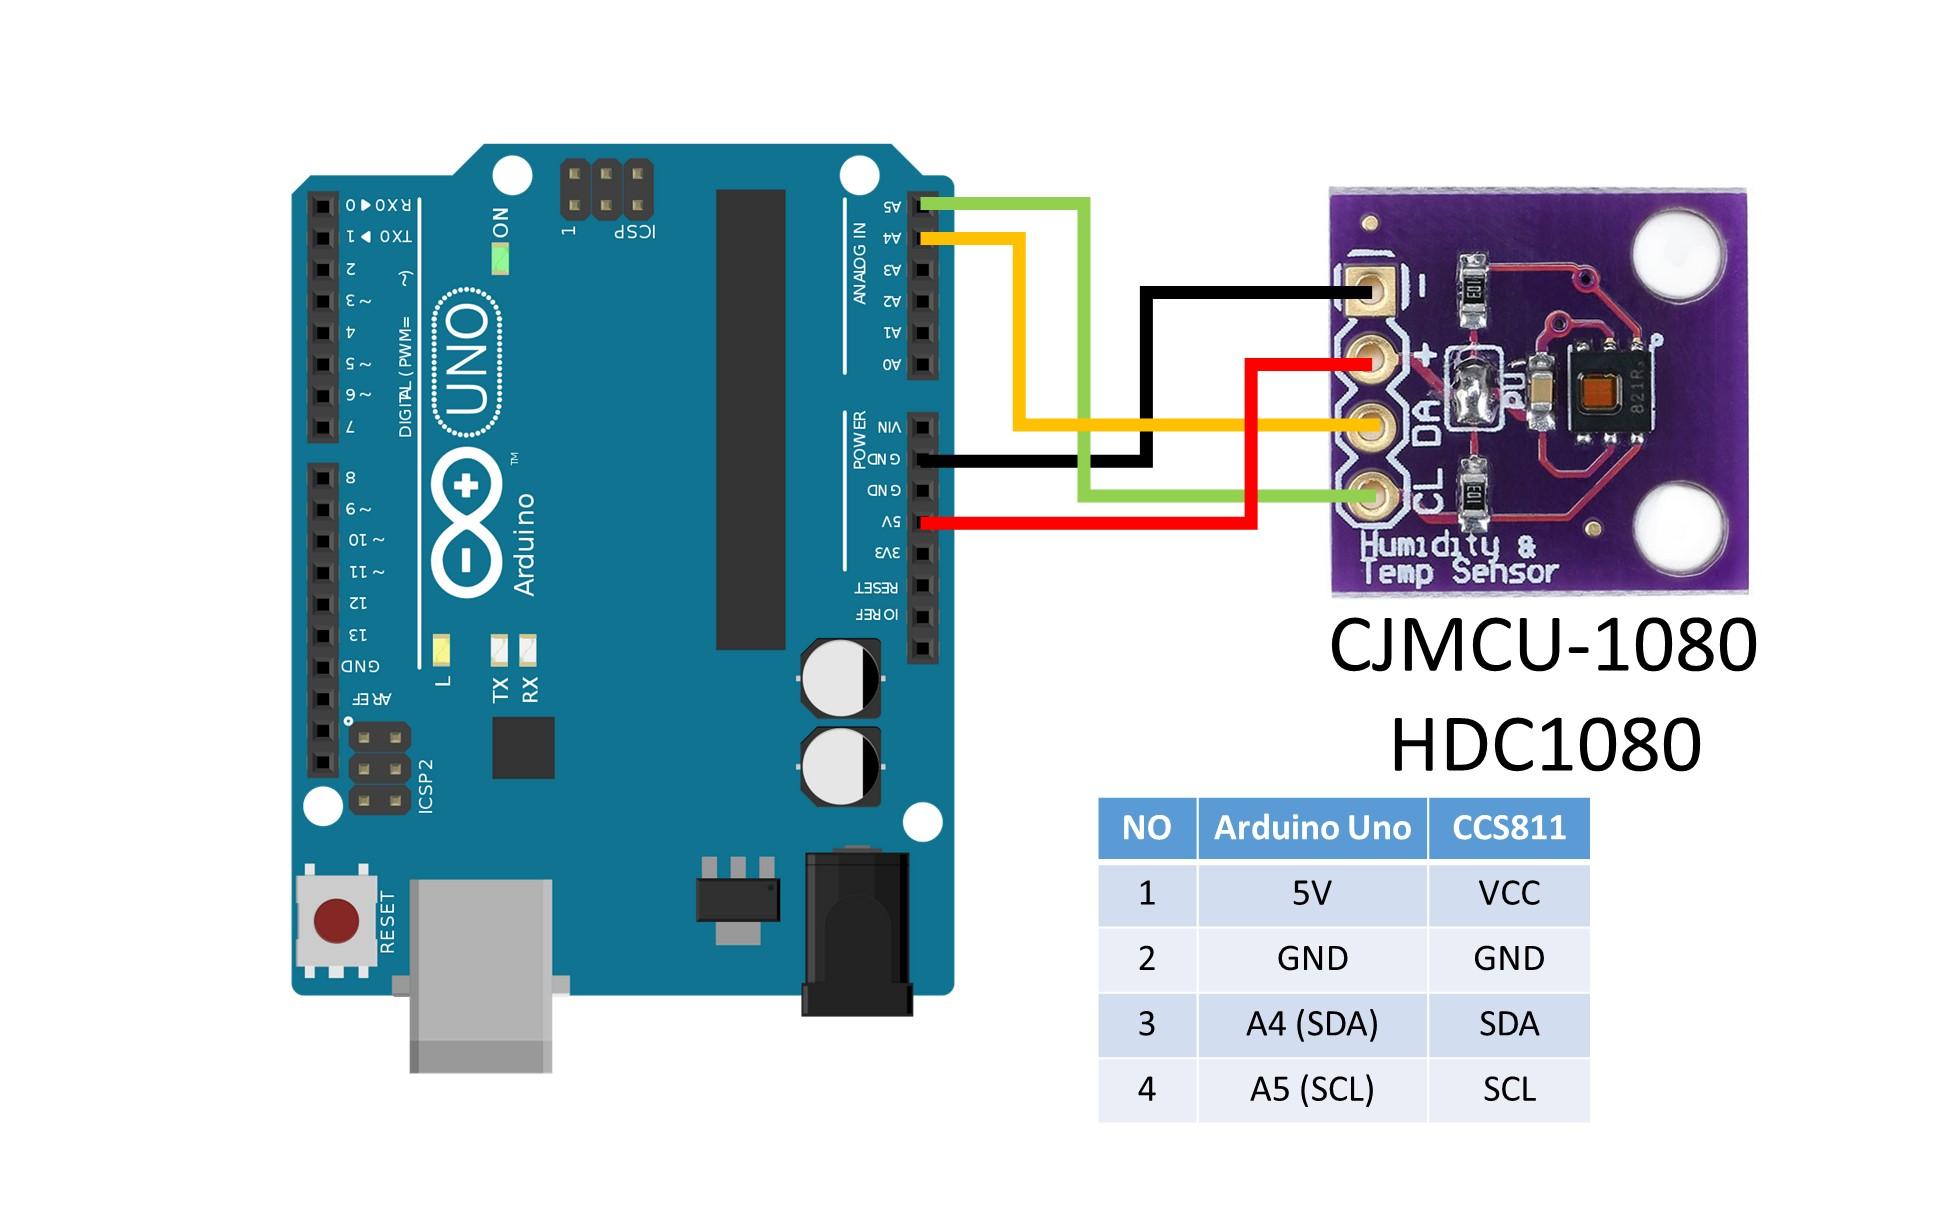 HDC1080 Arduino